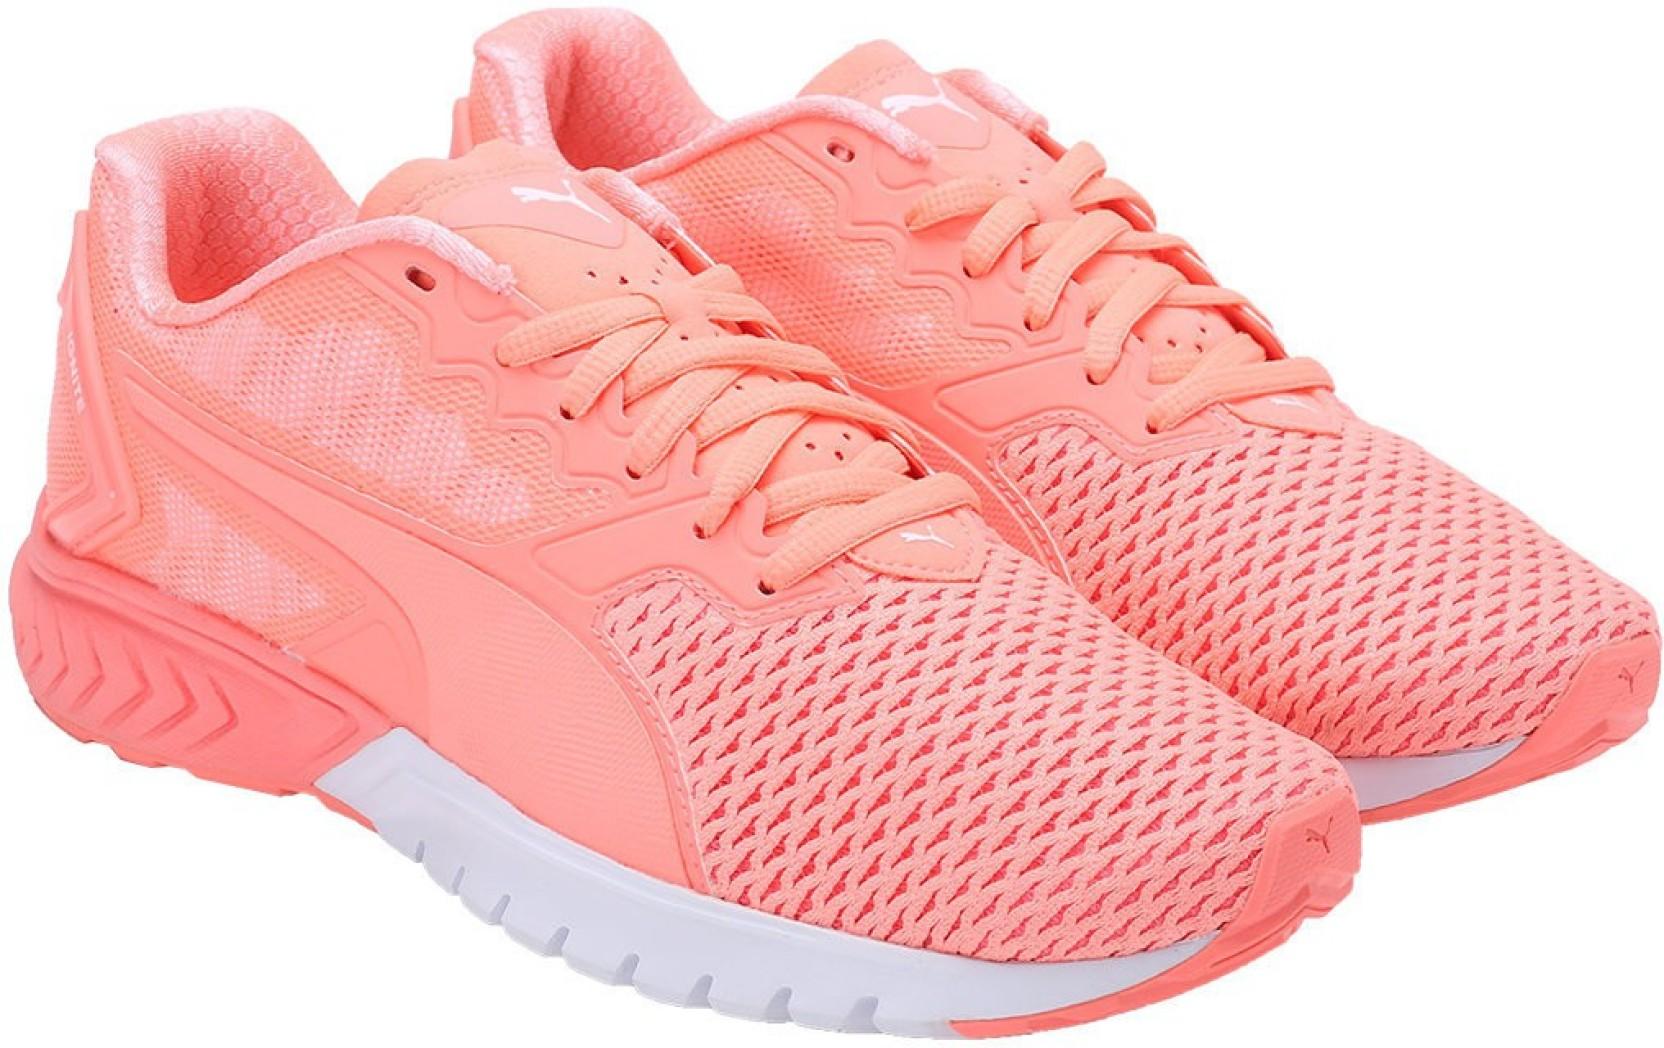 26c1625f136 Puma IGNITE Dual Mesh Wn s Running Shoes For Women - Buy Nrgy Peach ...